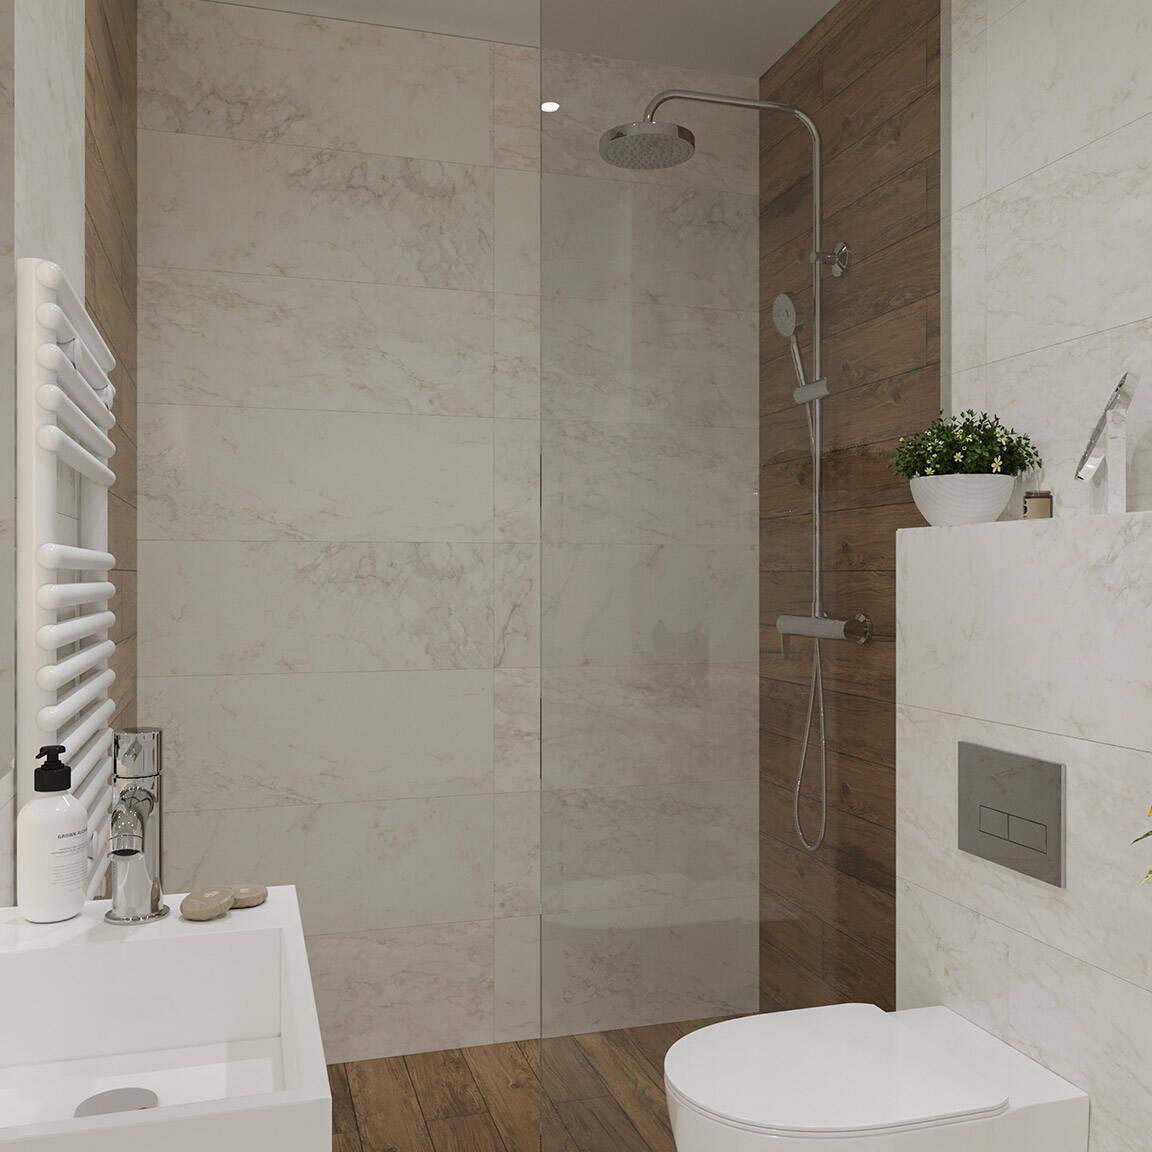 Catedral Residence - Bathroom - Marazzi Ceramic tiles - 7